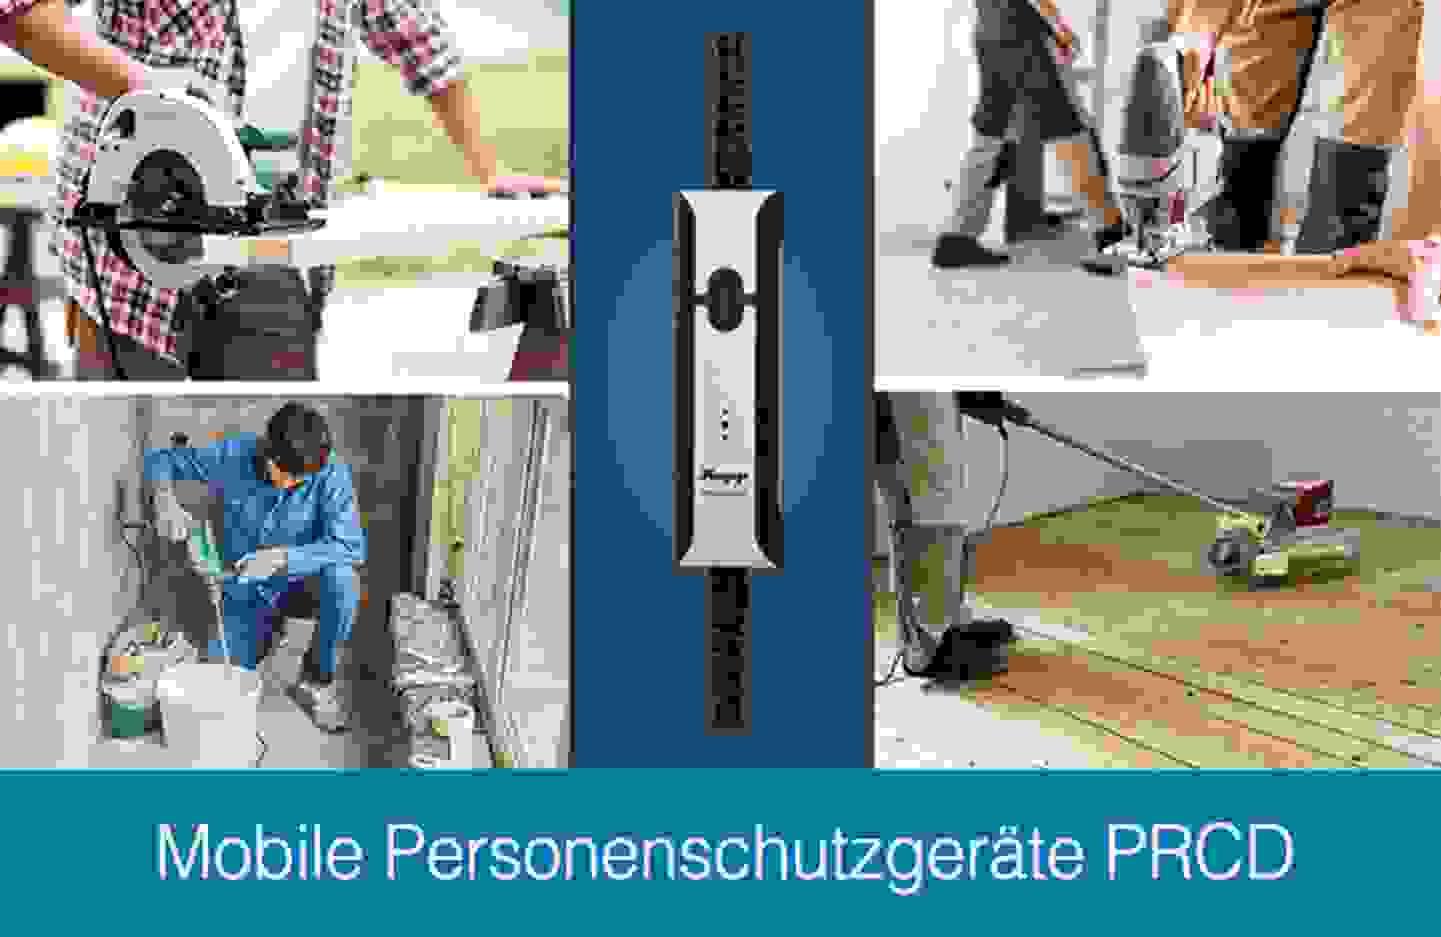 Kopp Mobile Personenschutzgeräte PRCD